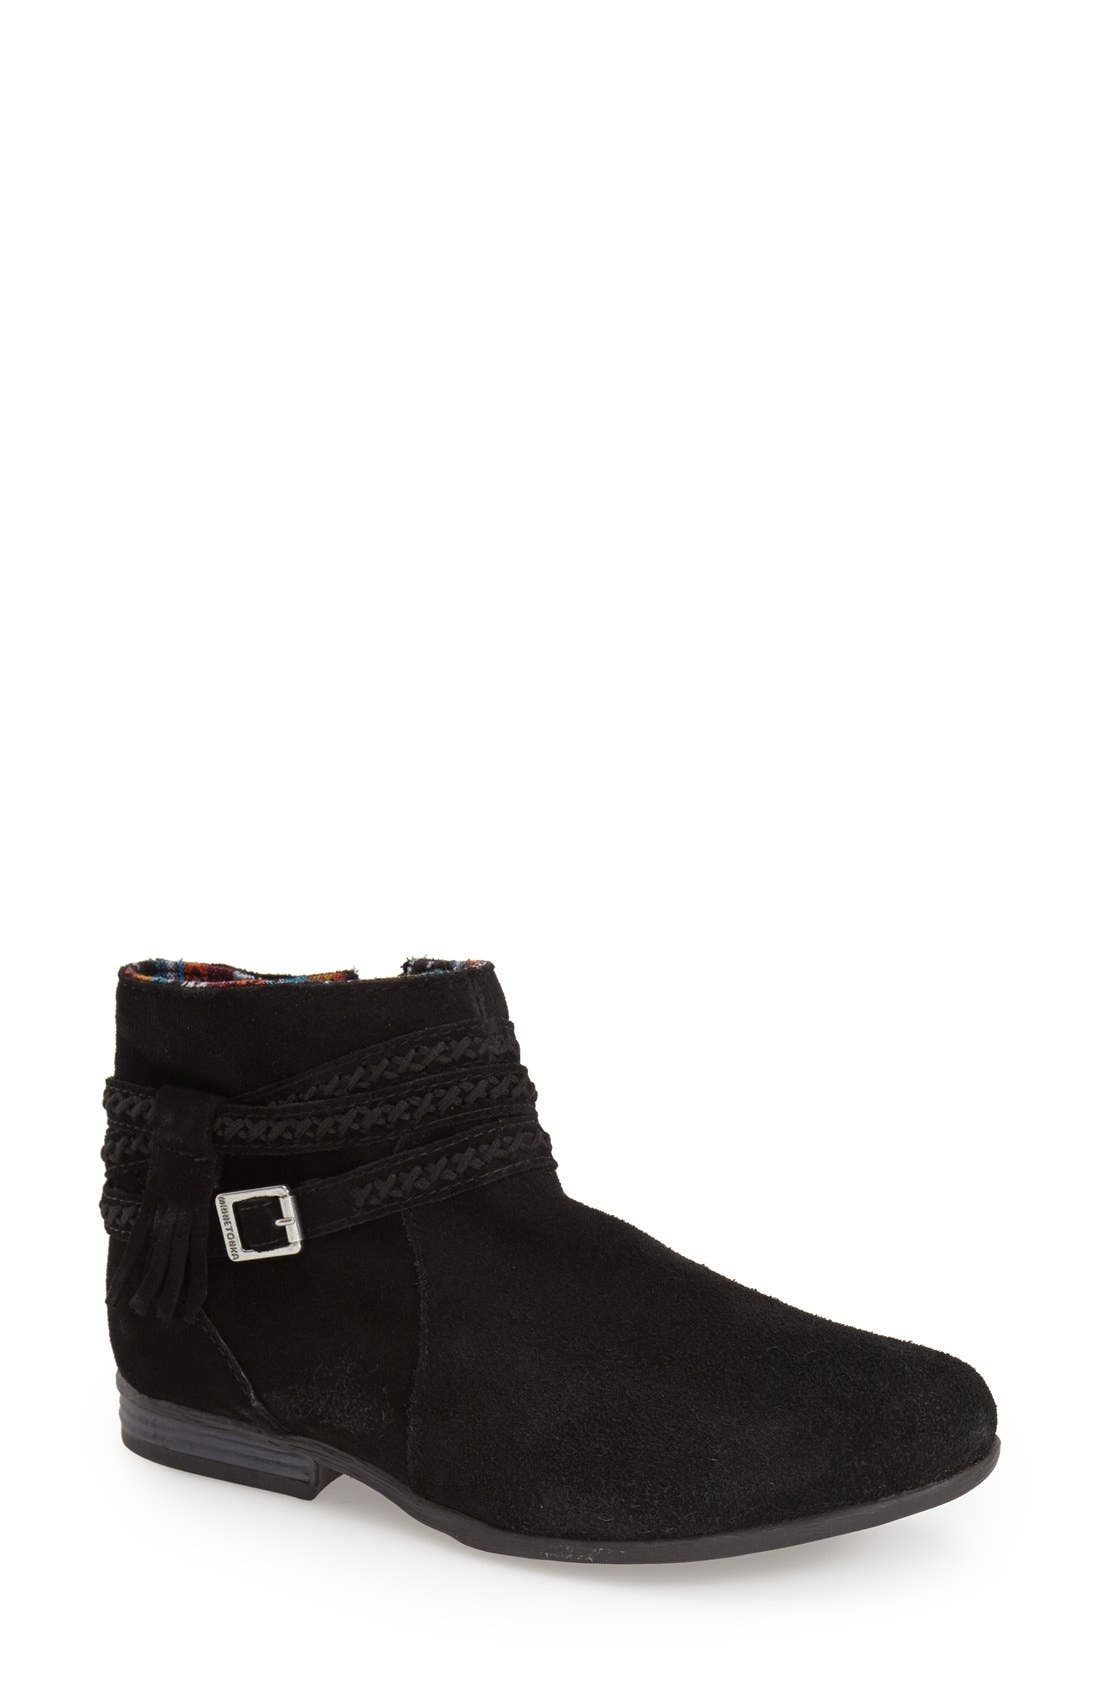 Alternate Image 1 Selected - Minnetonka'Dixon' Boot (Women)